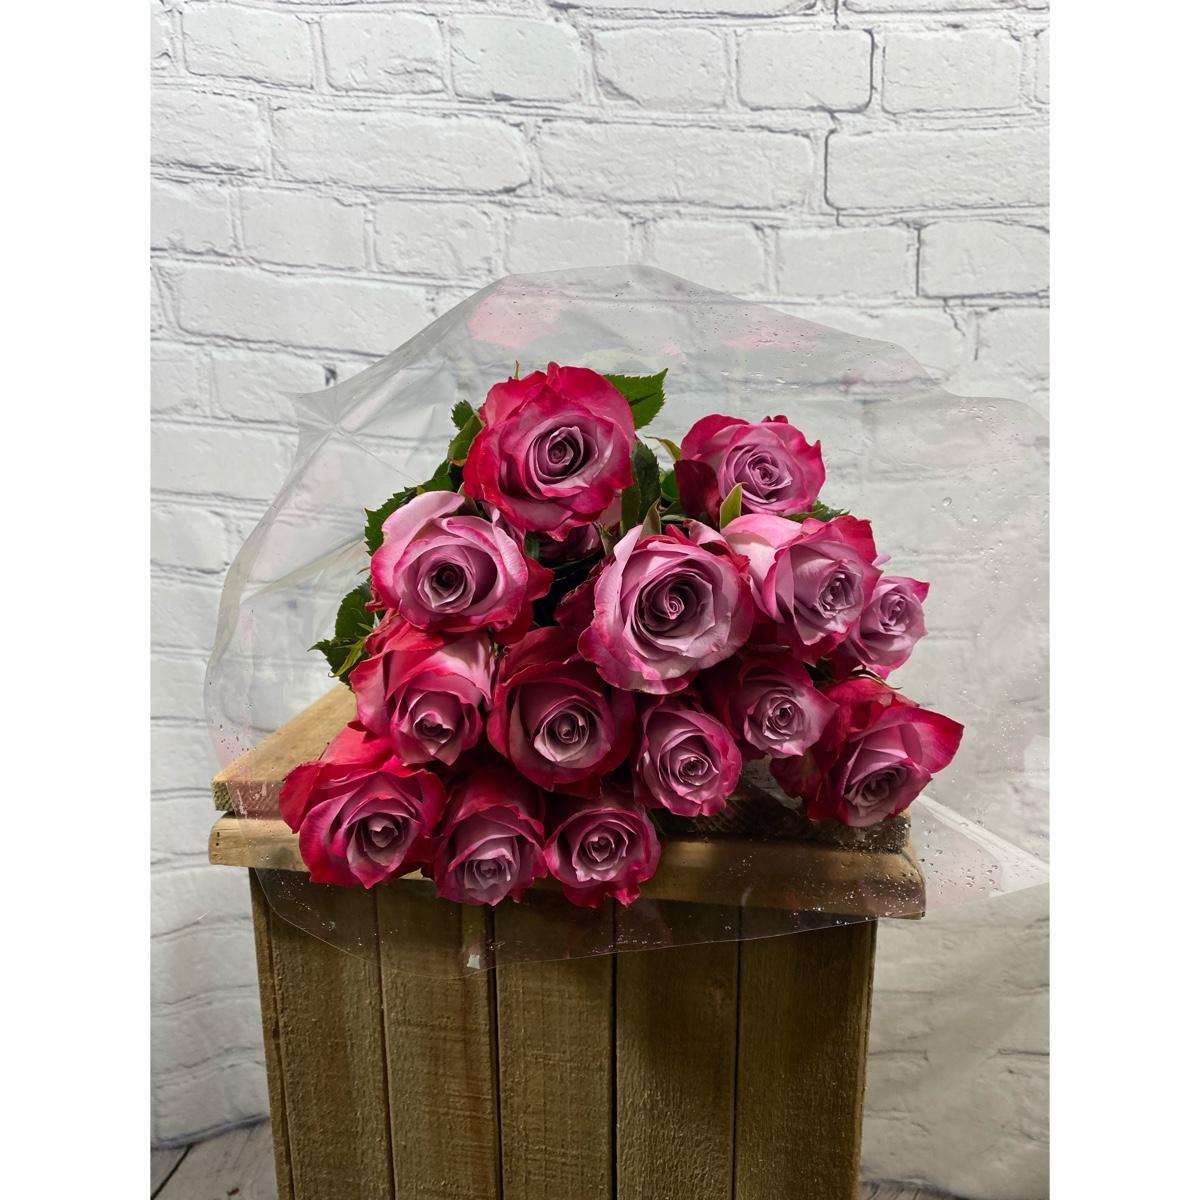 2 Dozen Fresh Cut Roses Vase ready This weeks special Deep purple